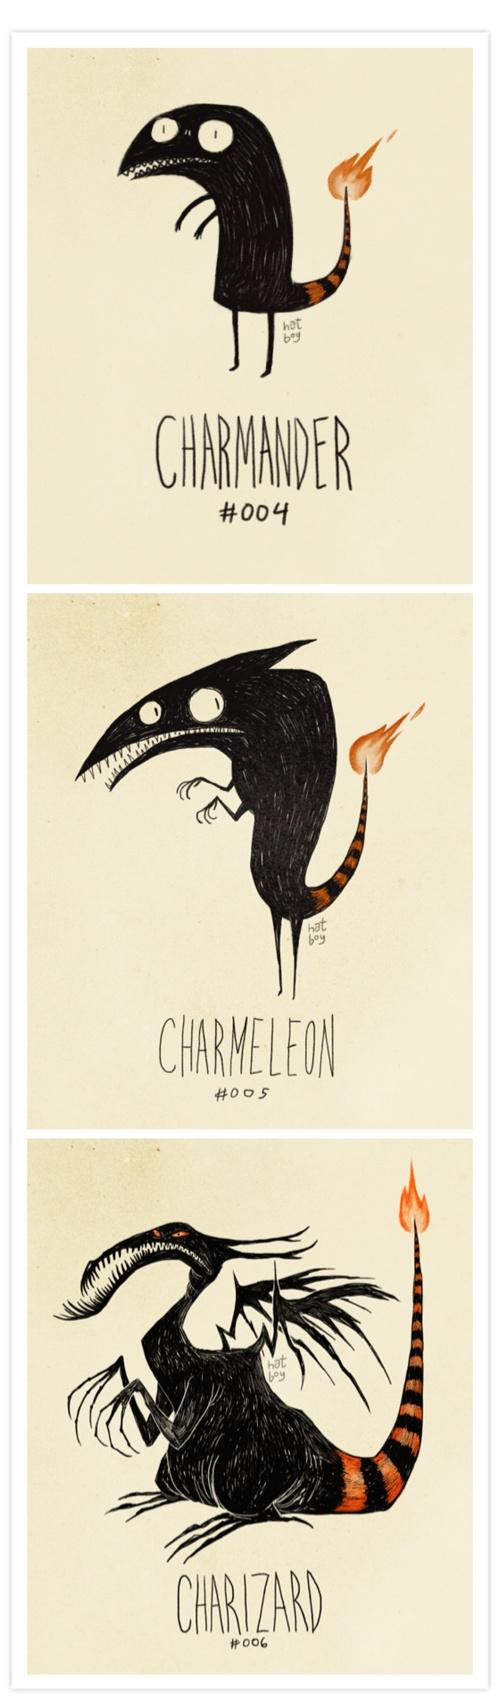 foto de Pokemon in the style of Tim Burton Charmander tattoo